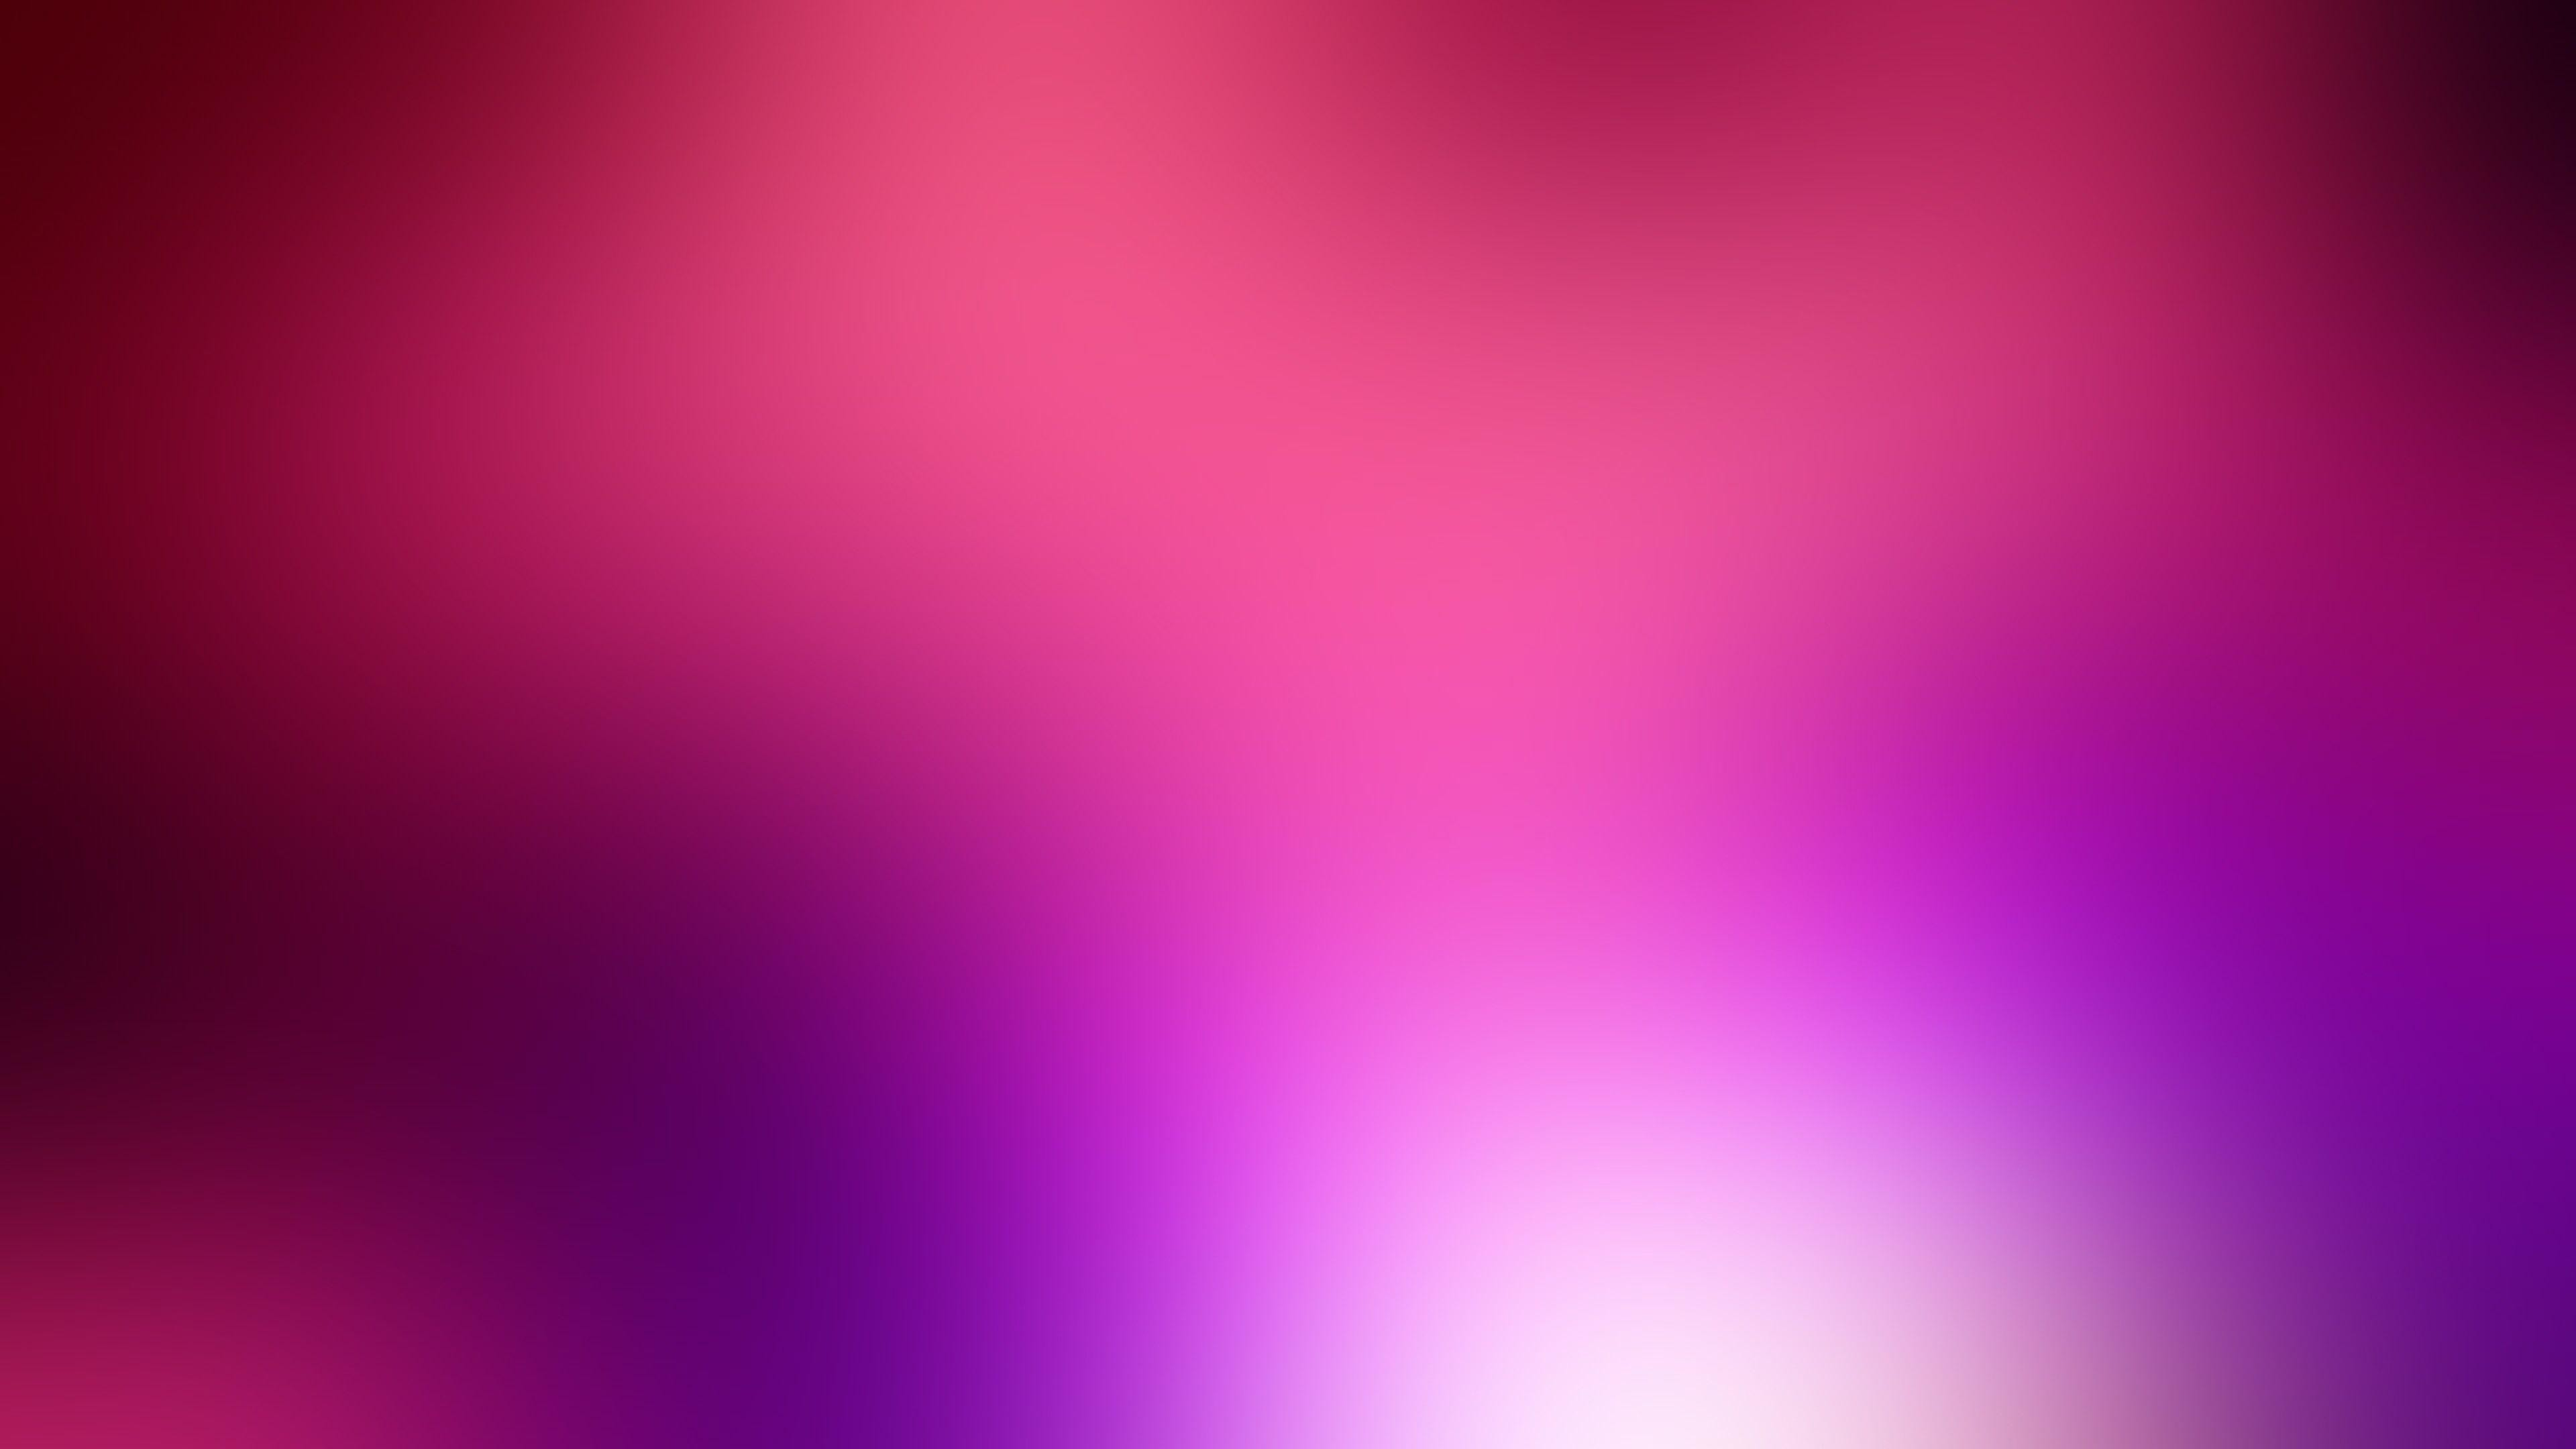 Wallpaper Pink Purple White Blue Lines Points Lights Glow X